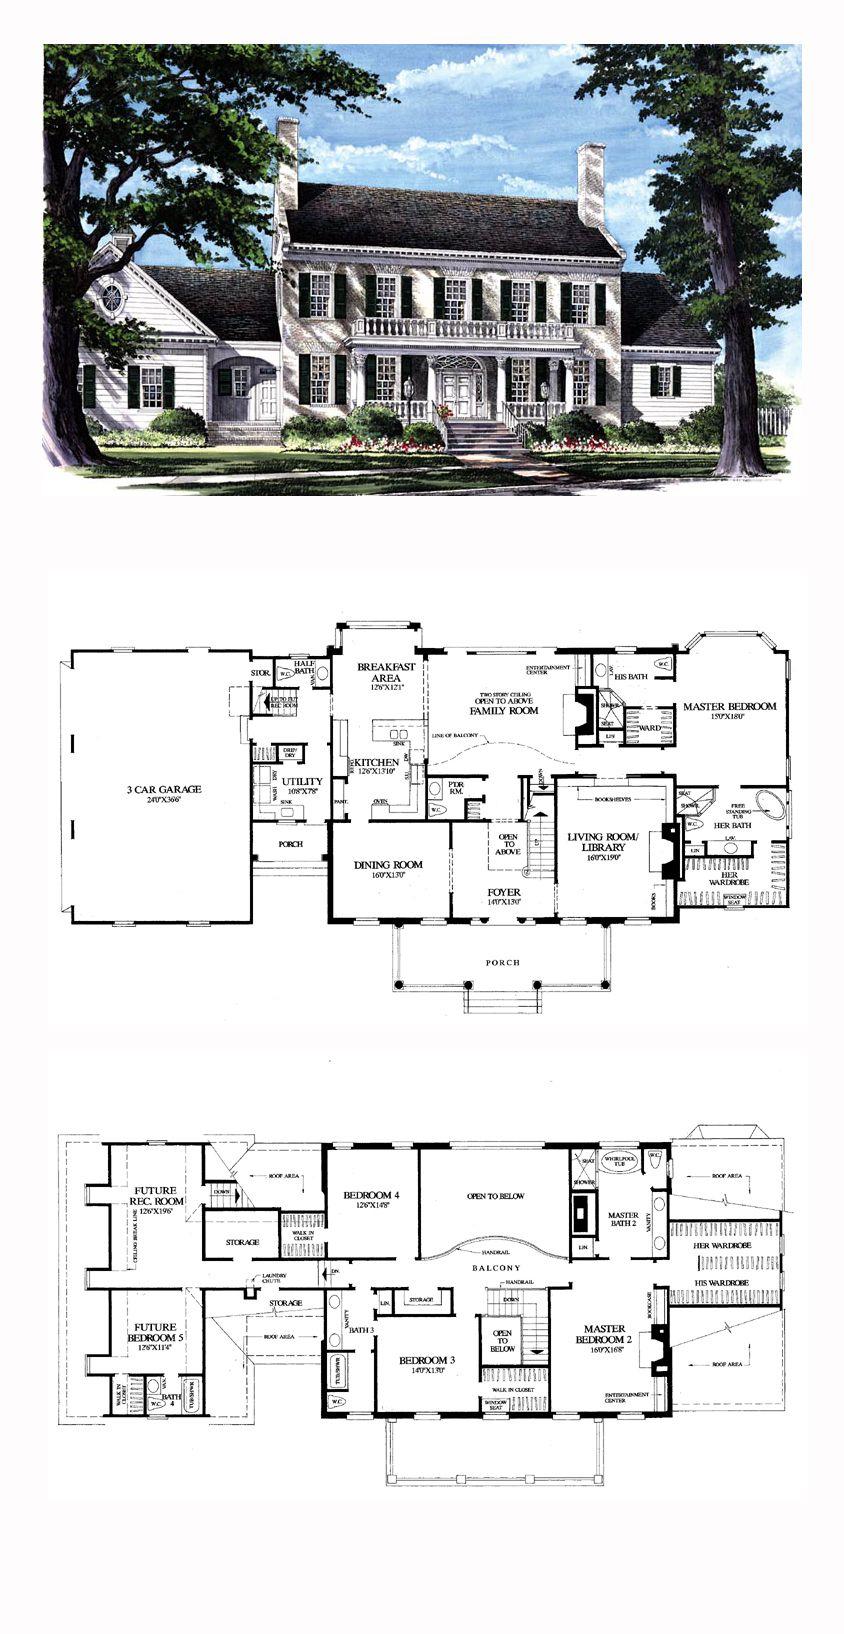 Plantation house plan 86287 total living area 4263 sq for Plantation floor plans